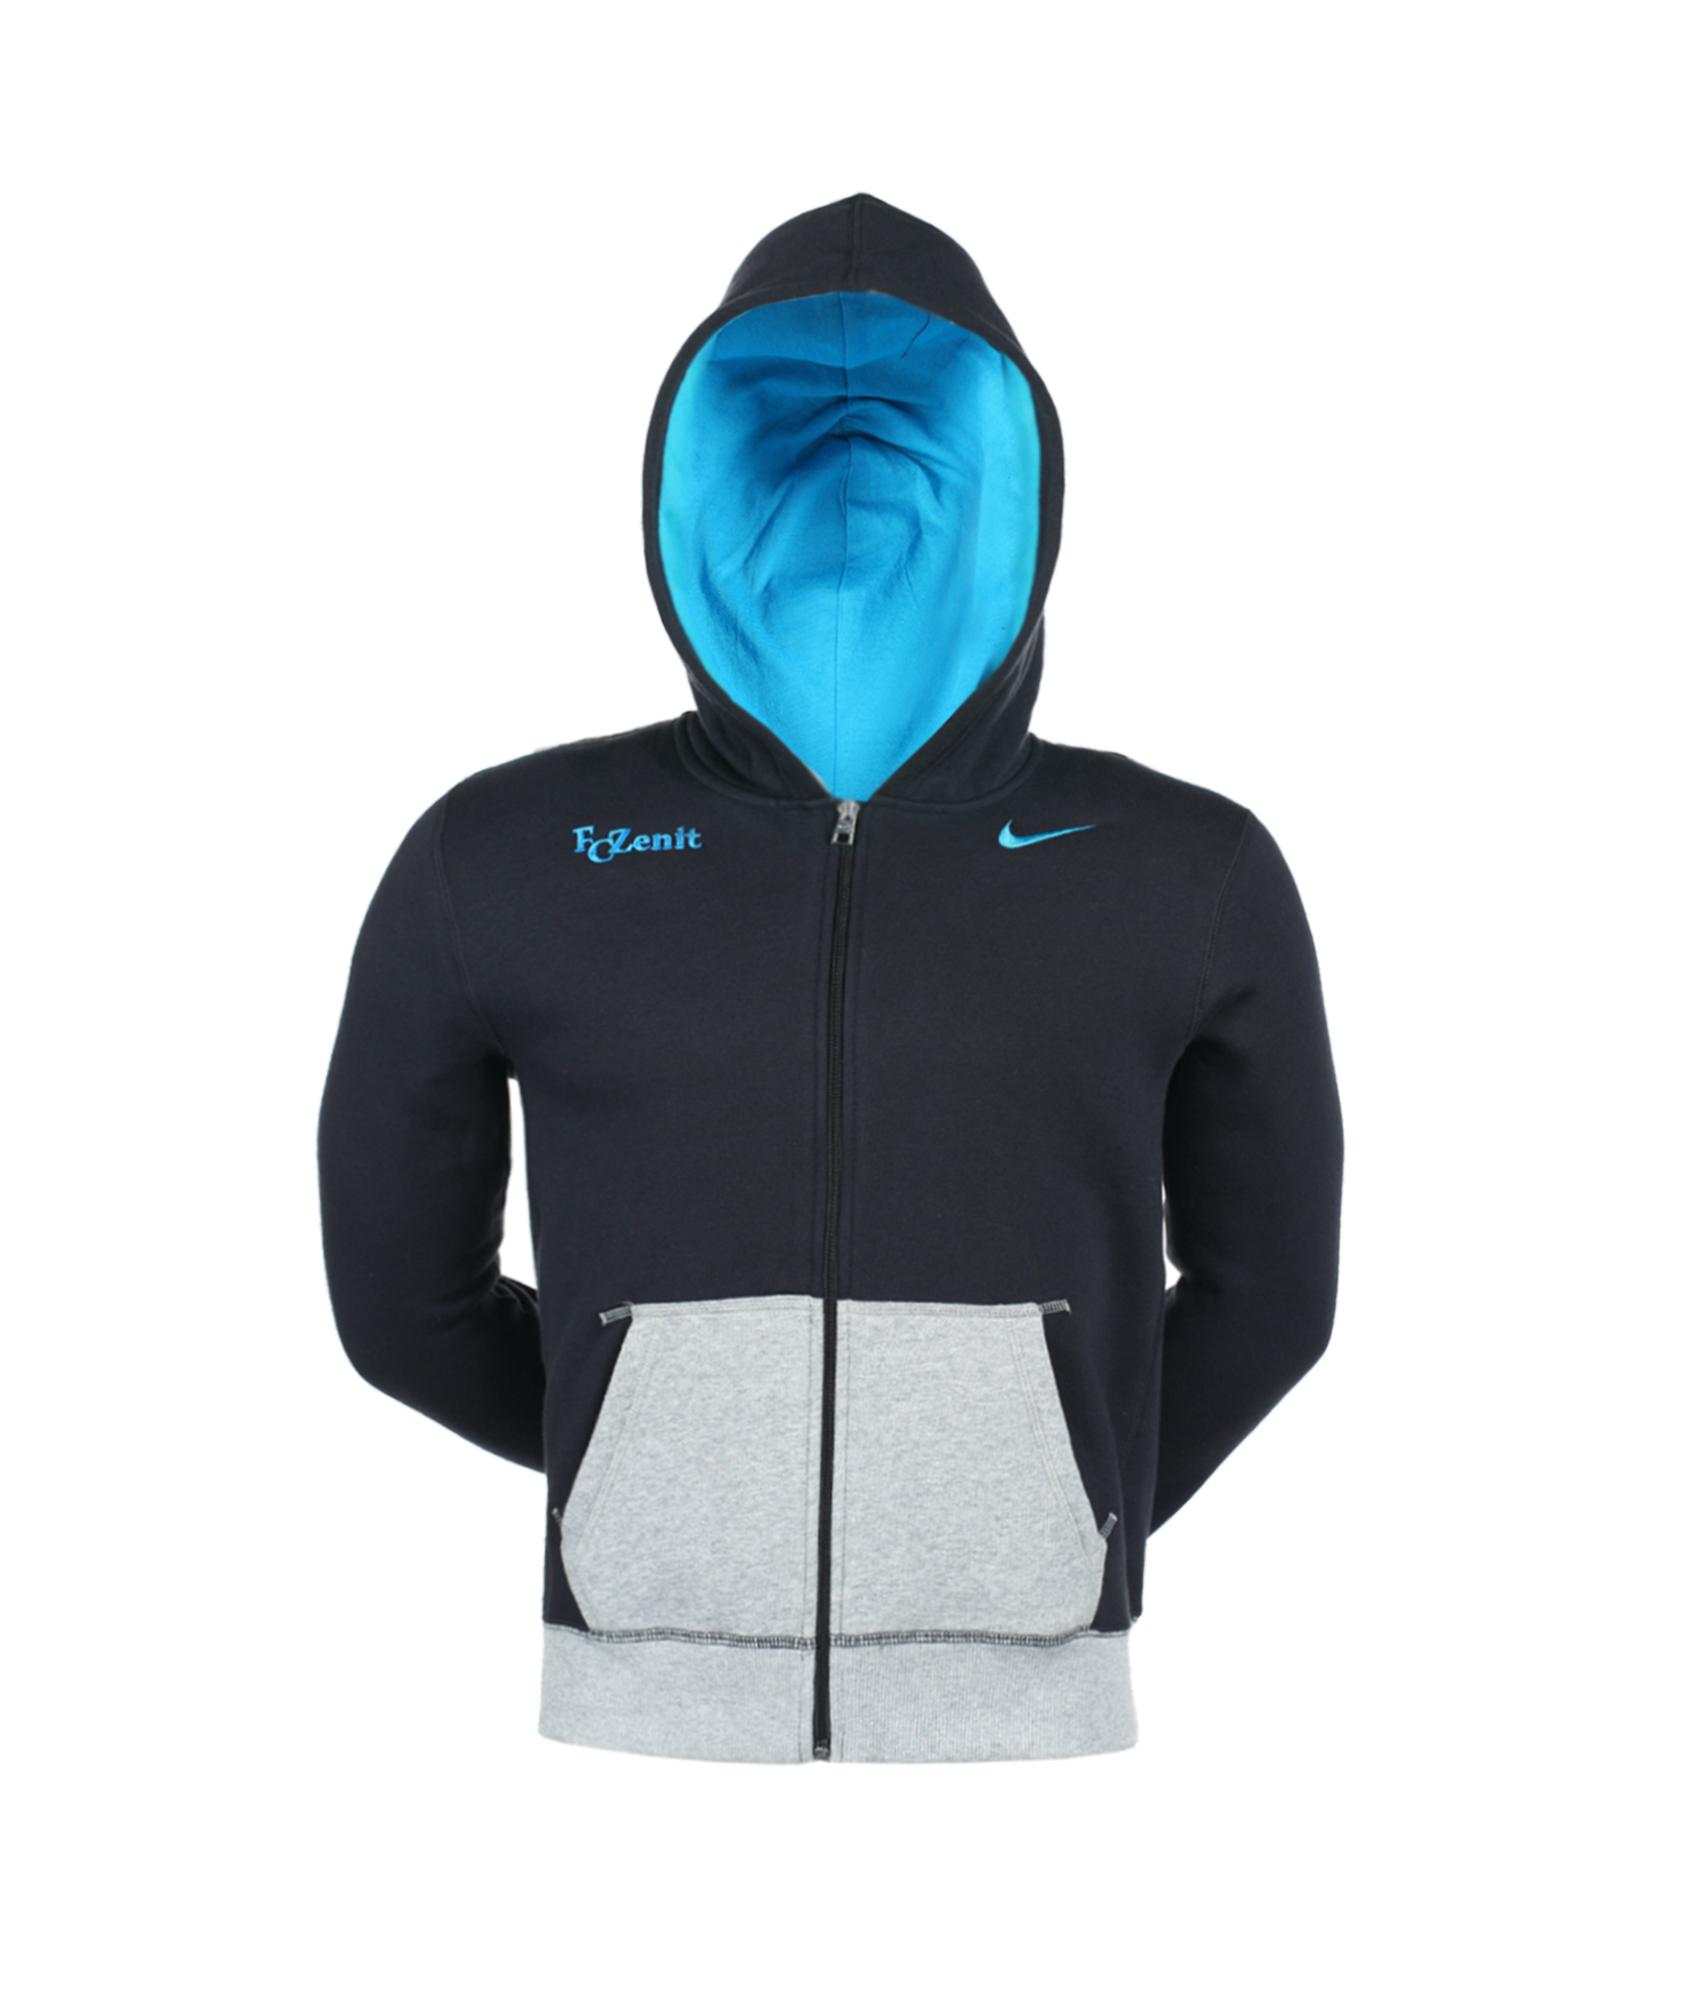 Толстовка Nike YA76 BF FZ HDY-BK, Цвет-Черный, Размер-XS